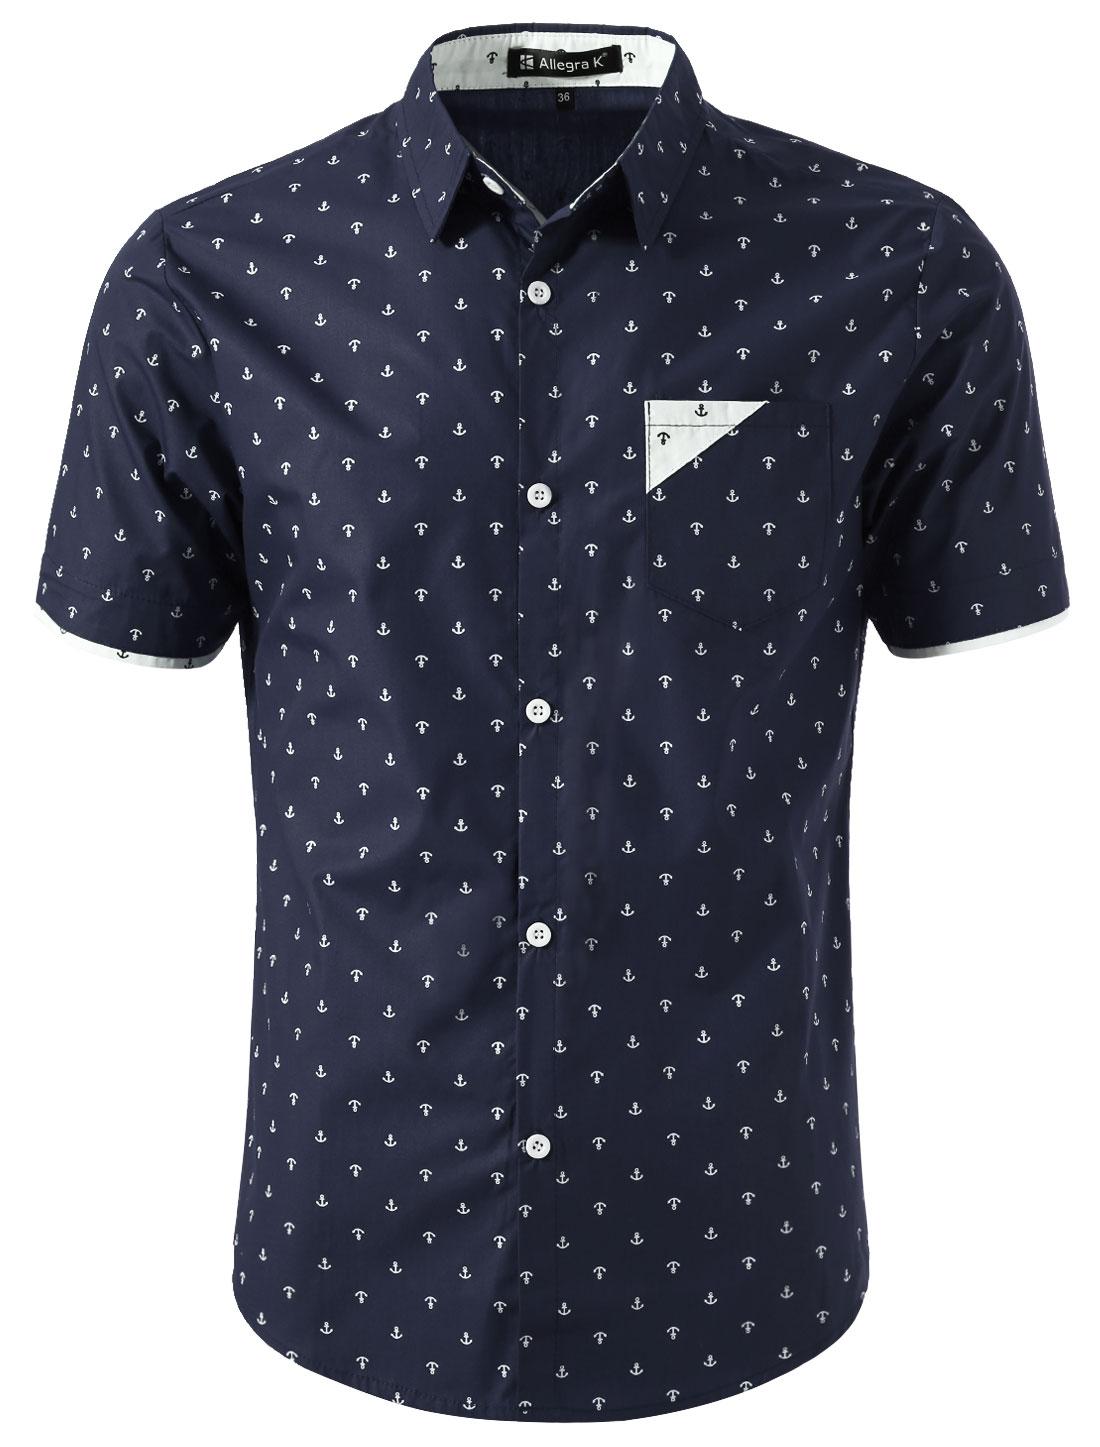 Men Point Collar Button Down Short Sleeve Anchor Casual Shirts Navy Blue L